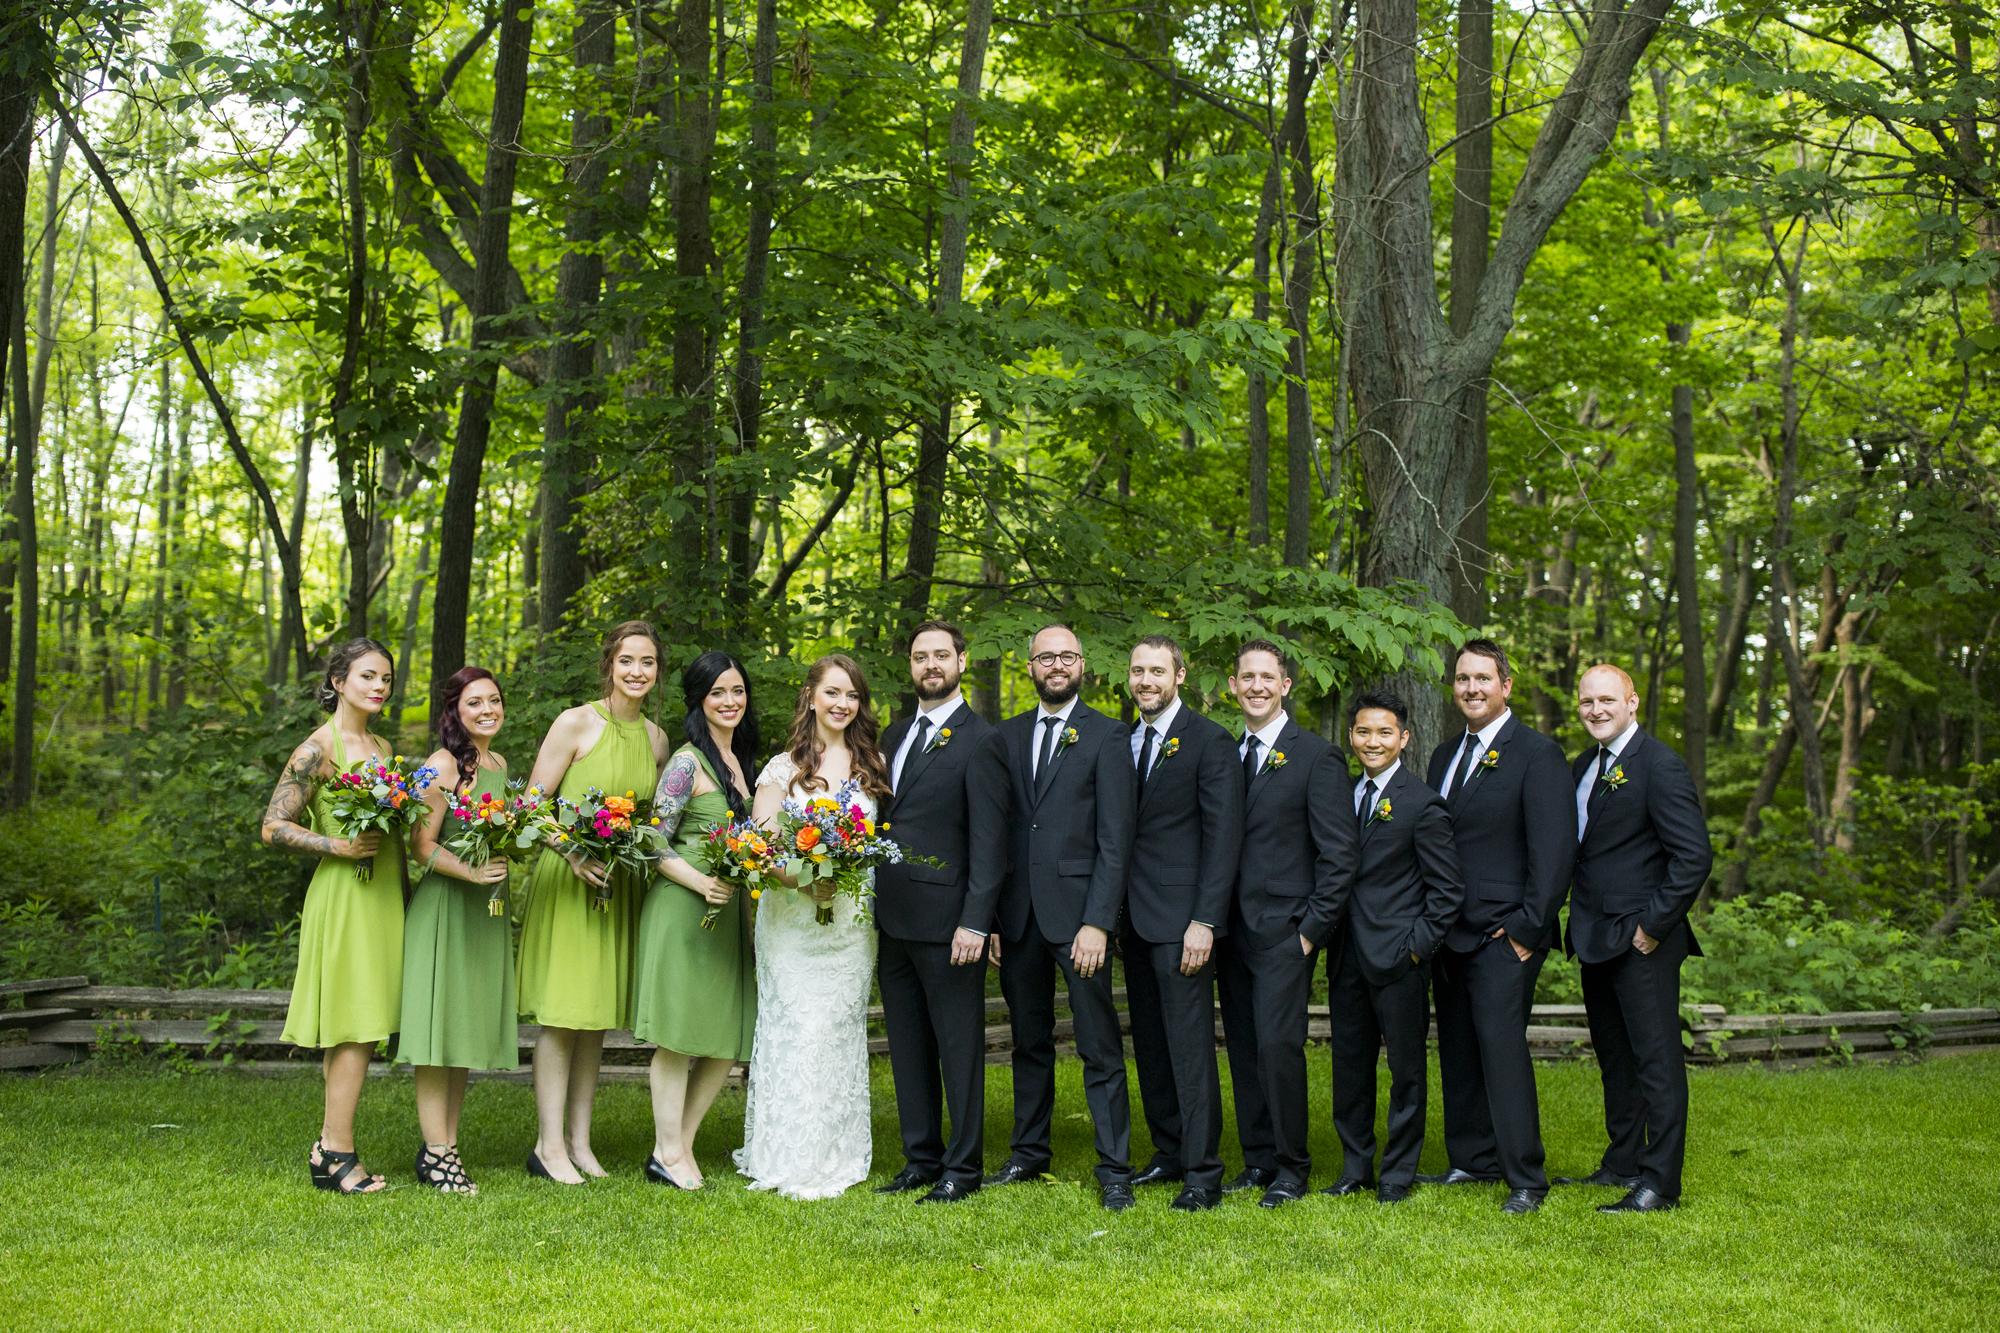 Seriously_Sabrina_Photography_Milwaukee_Wisconsin_Wedding_Schlitz_Audubon_Nature_Center_BrunderRife44.jpg